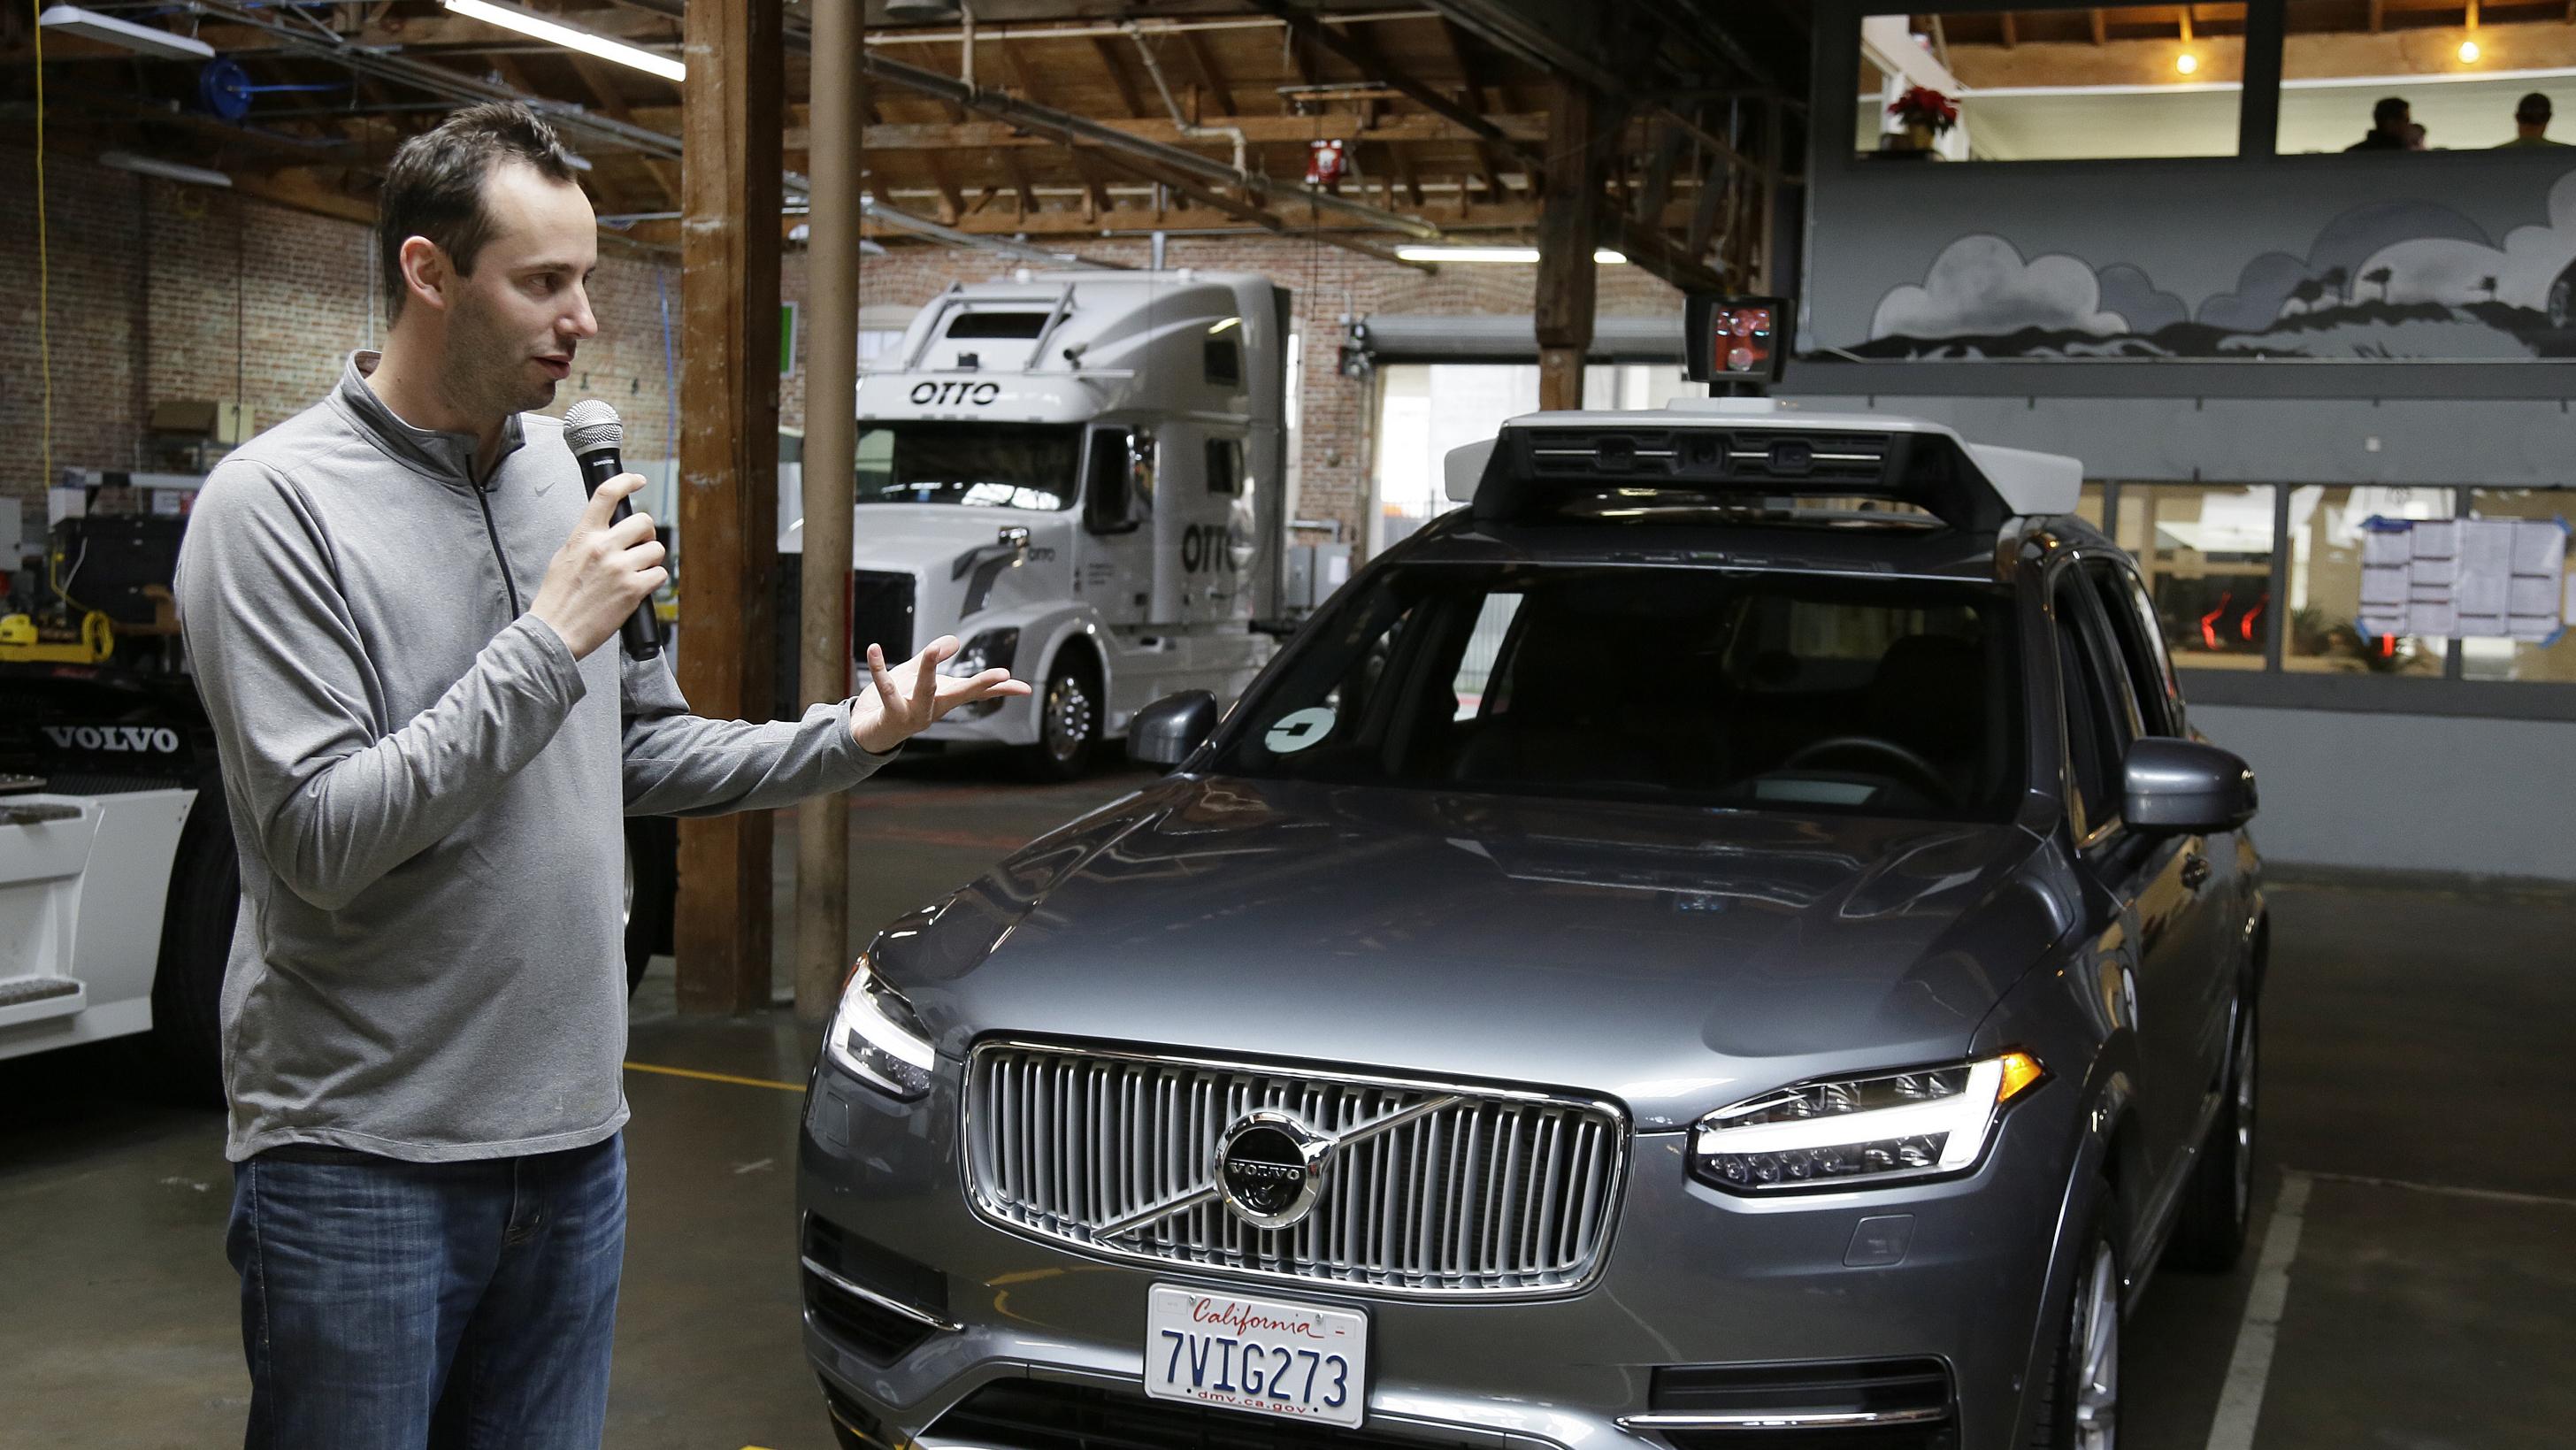 Anthony Levandowski with Uber self-driving car